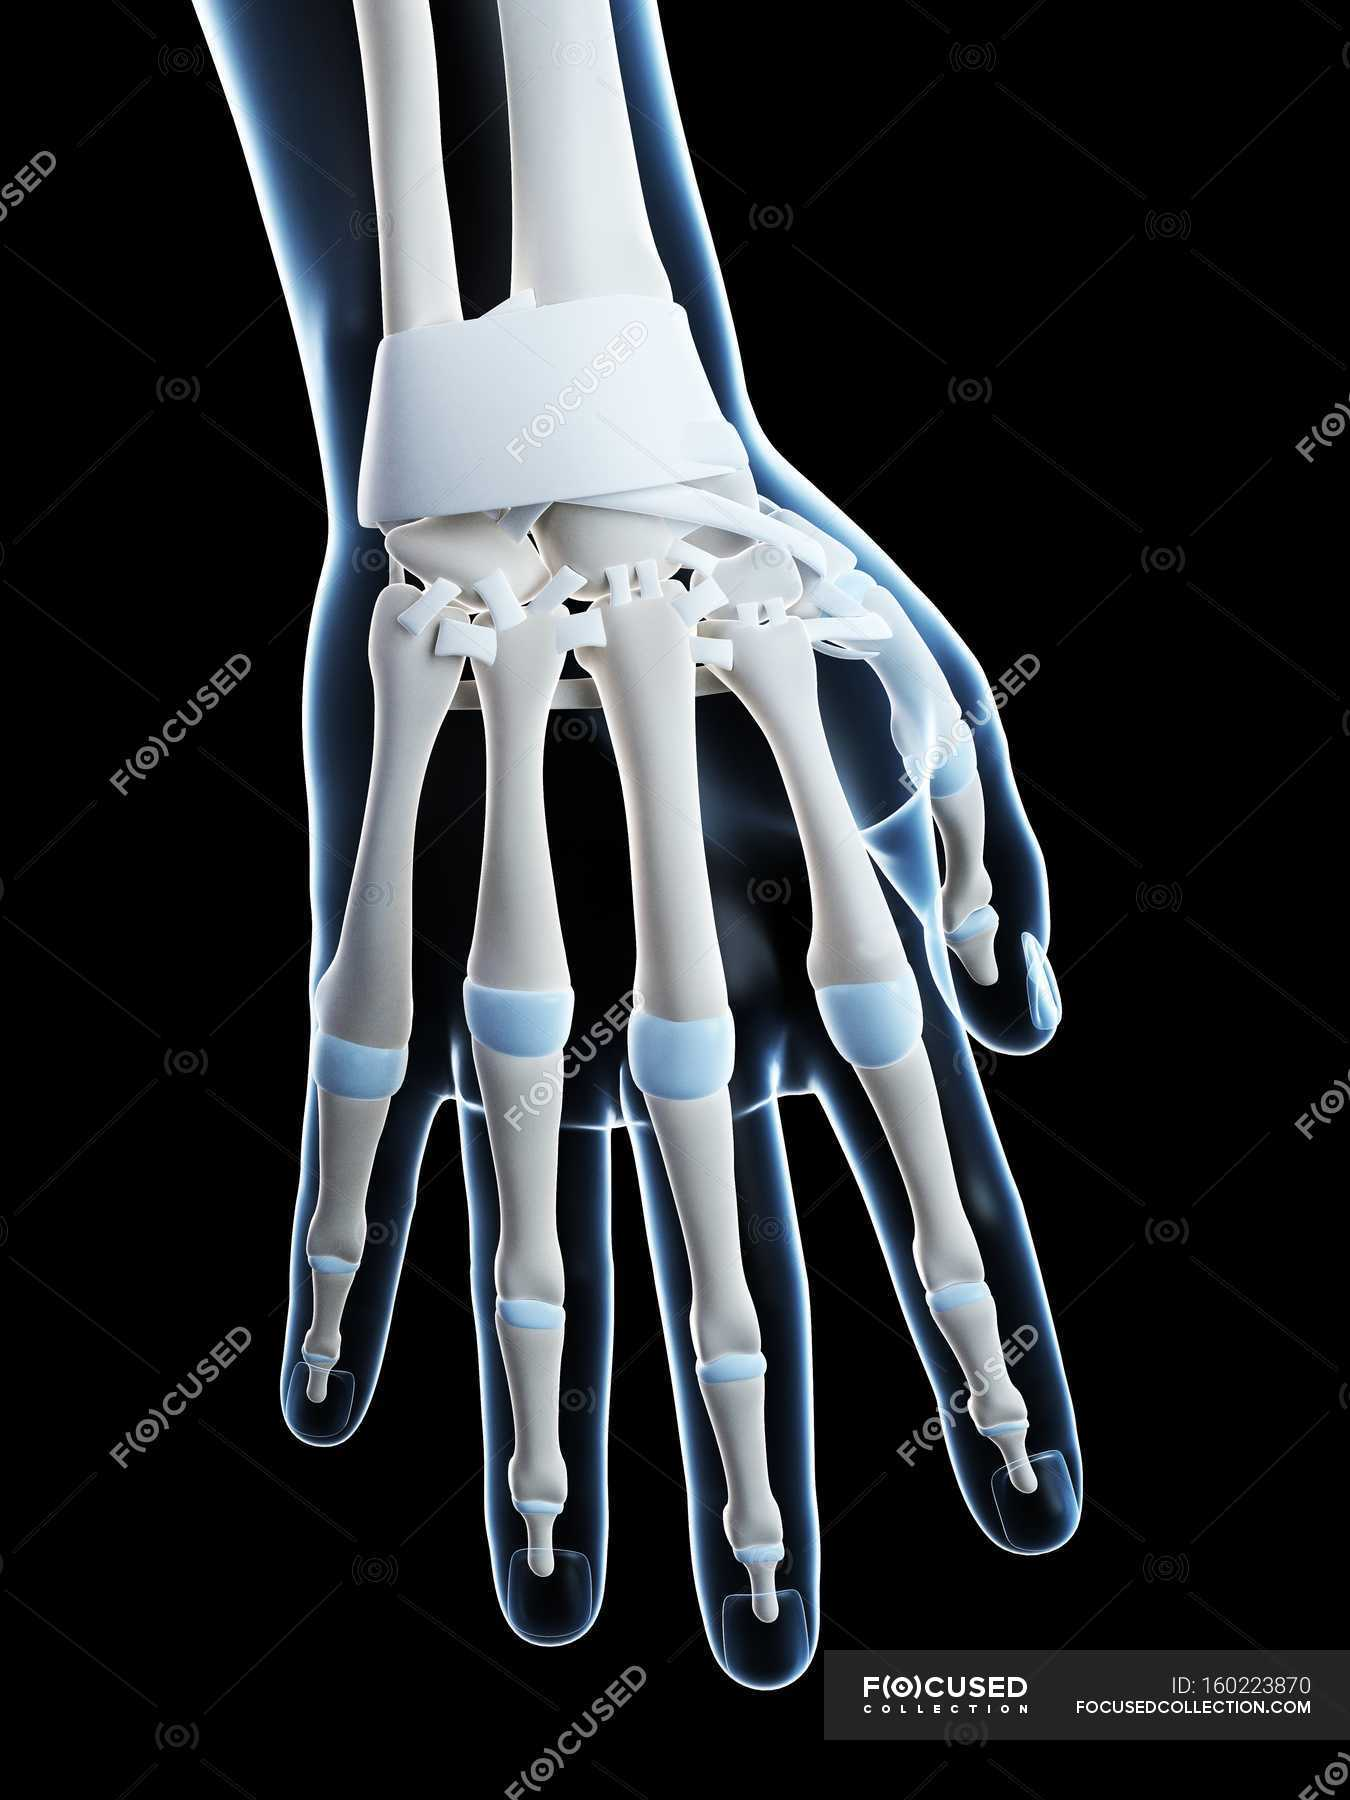 Human hand bones anatomy — Stock Photo | #160223870